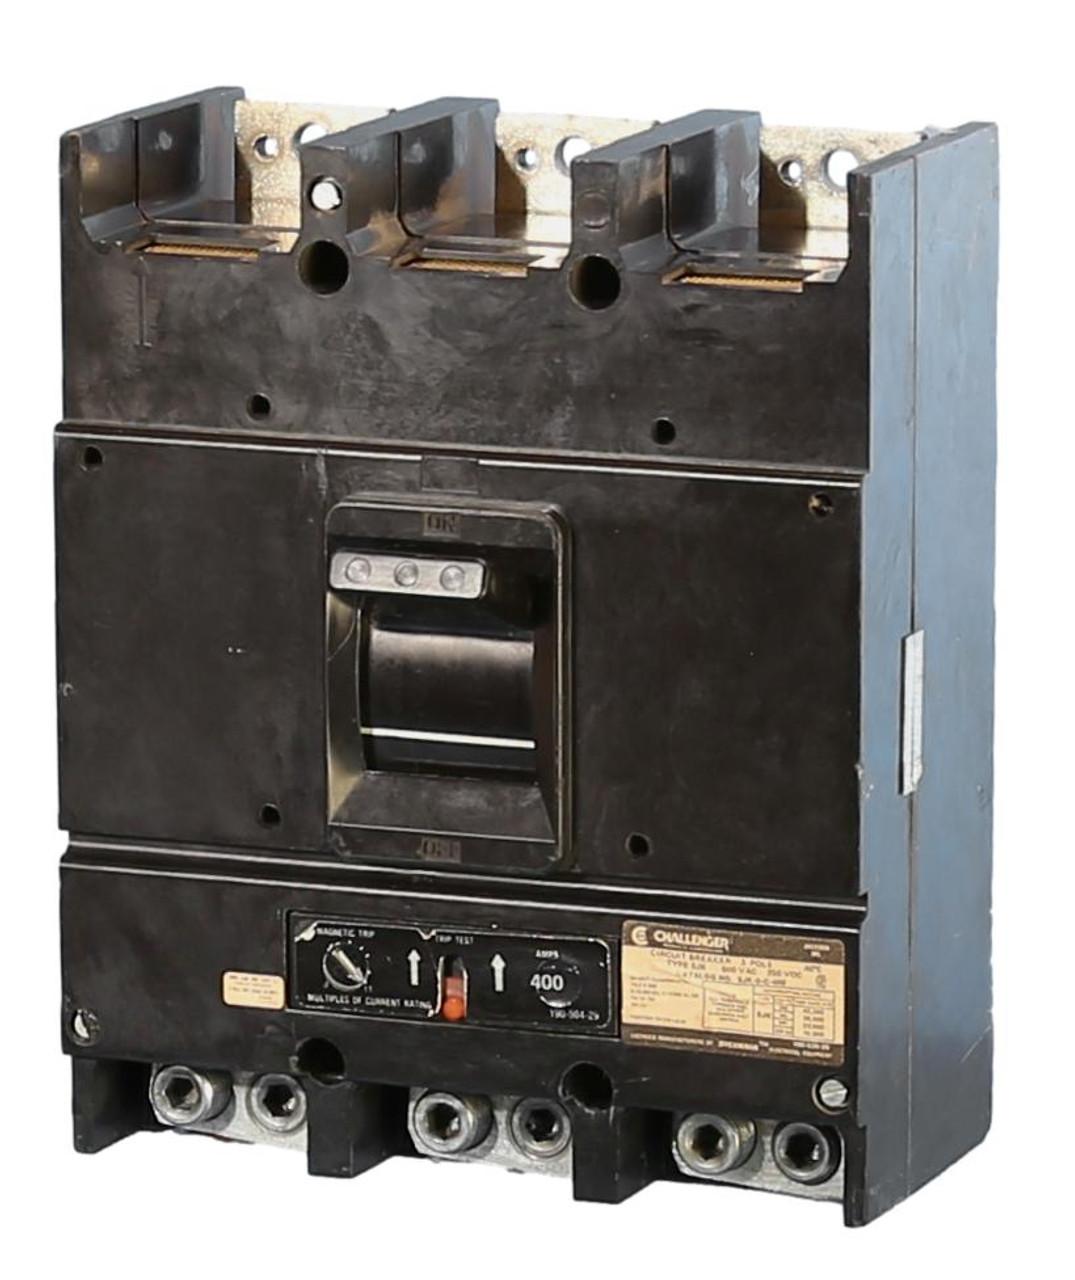 SJK-3-C-400 Challenger Circuit Breaker 400 Amp Frame 400A Trip